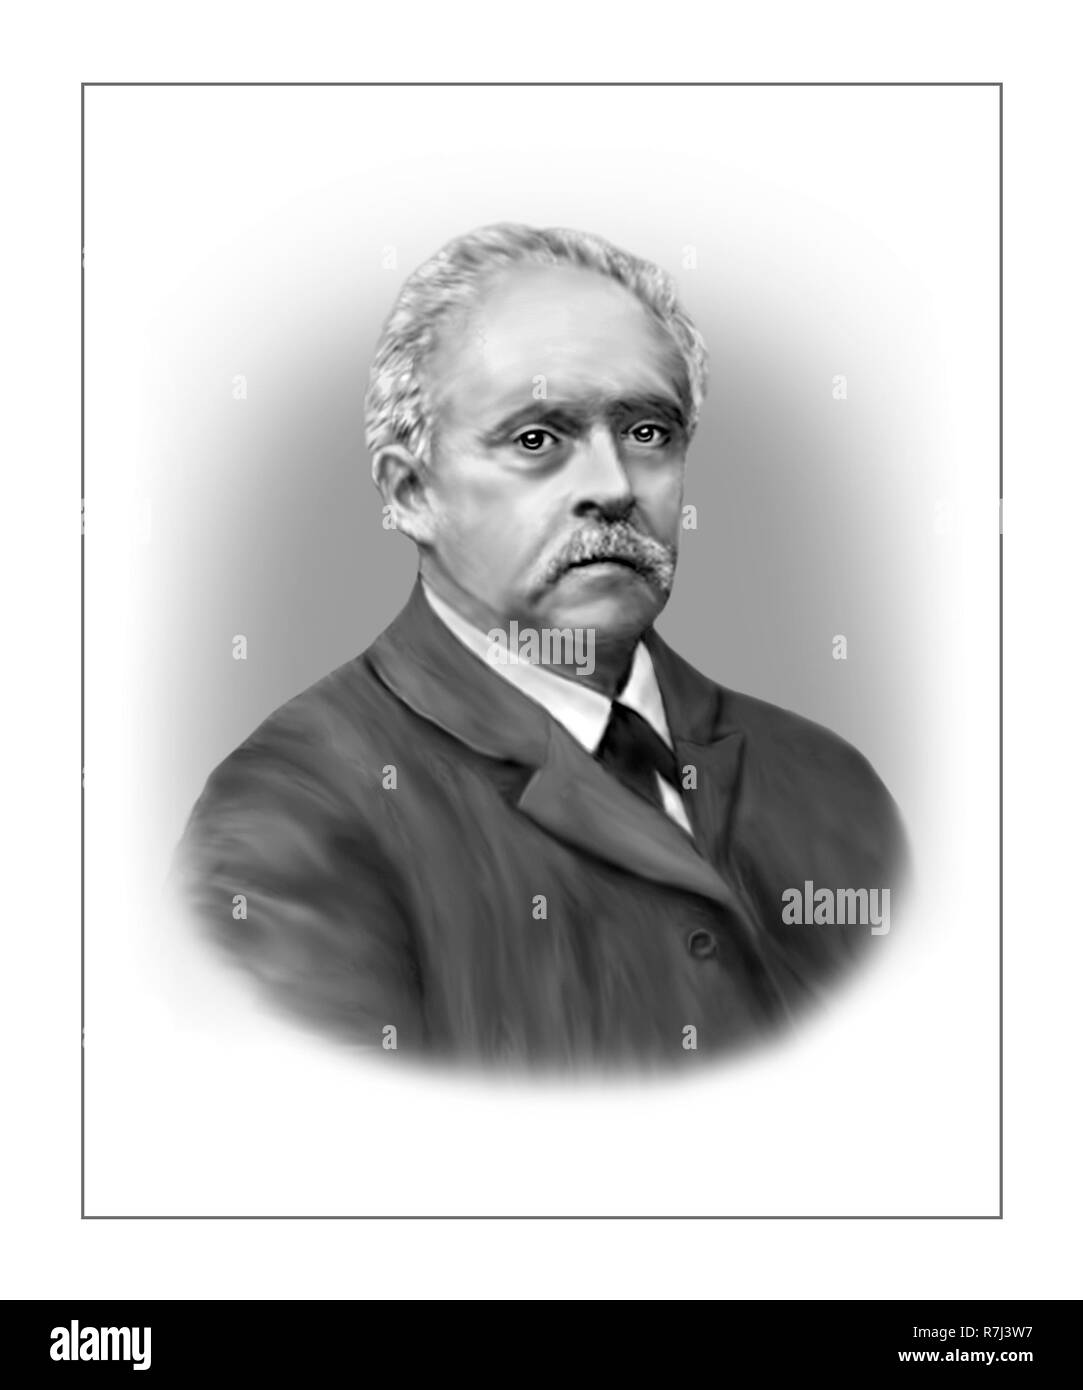 Hermann von Helmholtz 1821 - 1894 Tedesco il fisico medico Immagini Stock